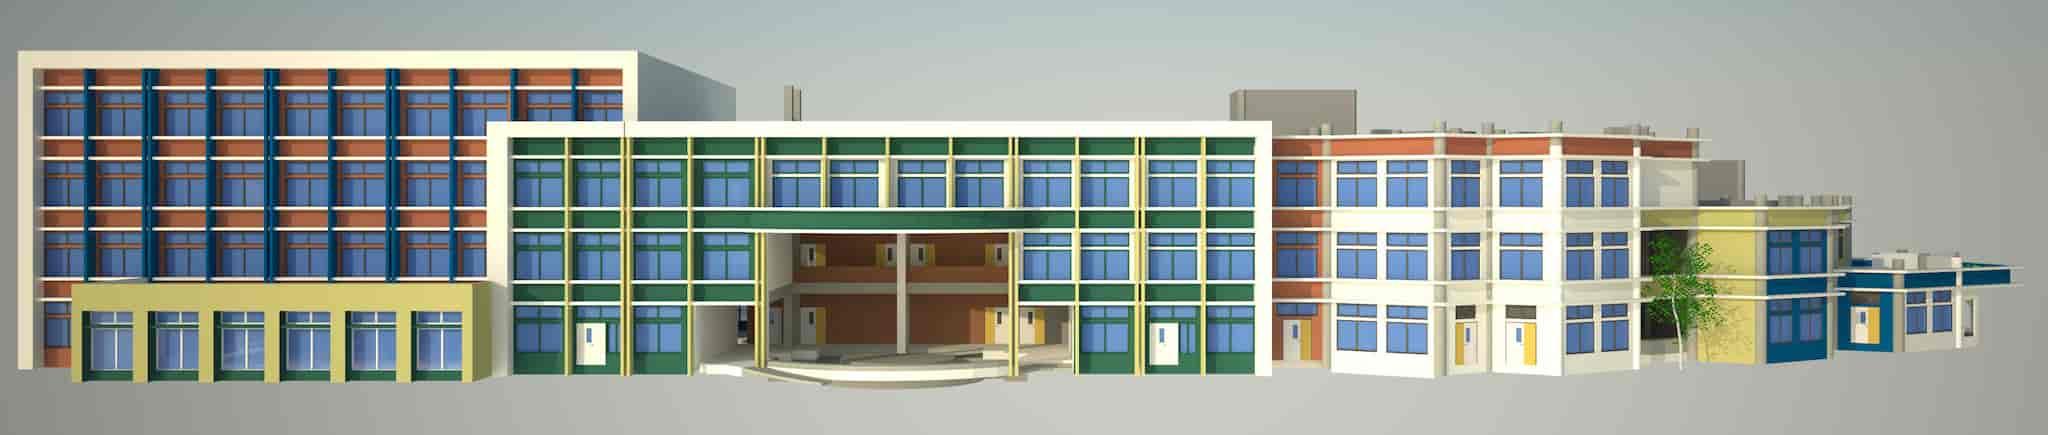 Zjz Design Studio Noida Architects In Noida Delhi Justdial